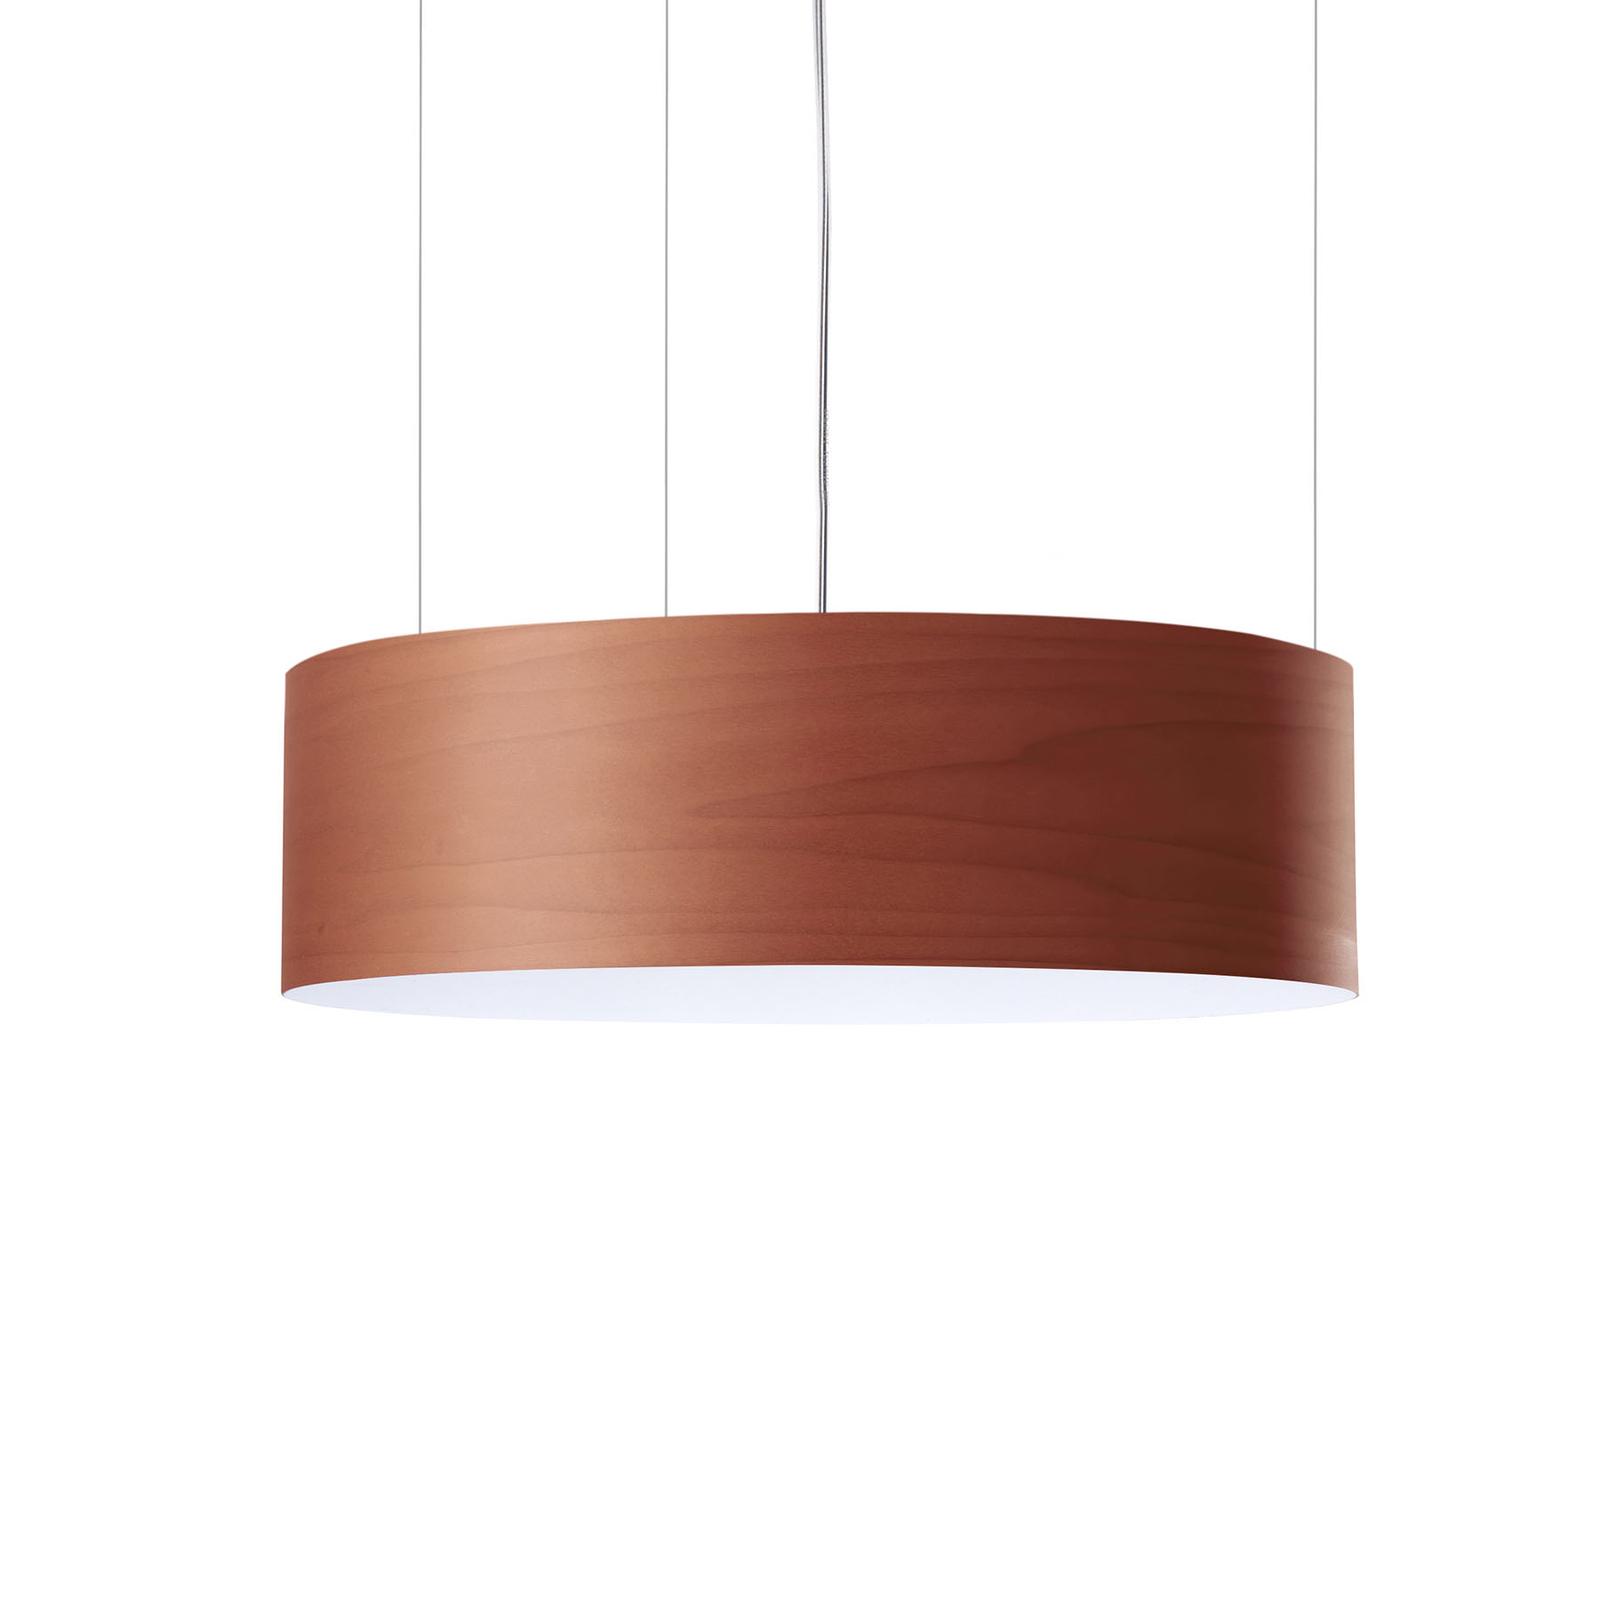 LZF Gea Slim LED-hengelampe 0-10V dim, sjokolade